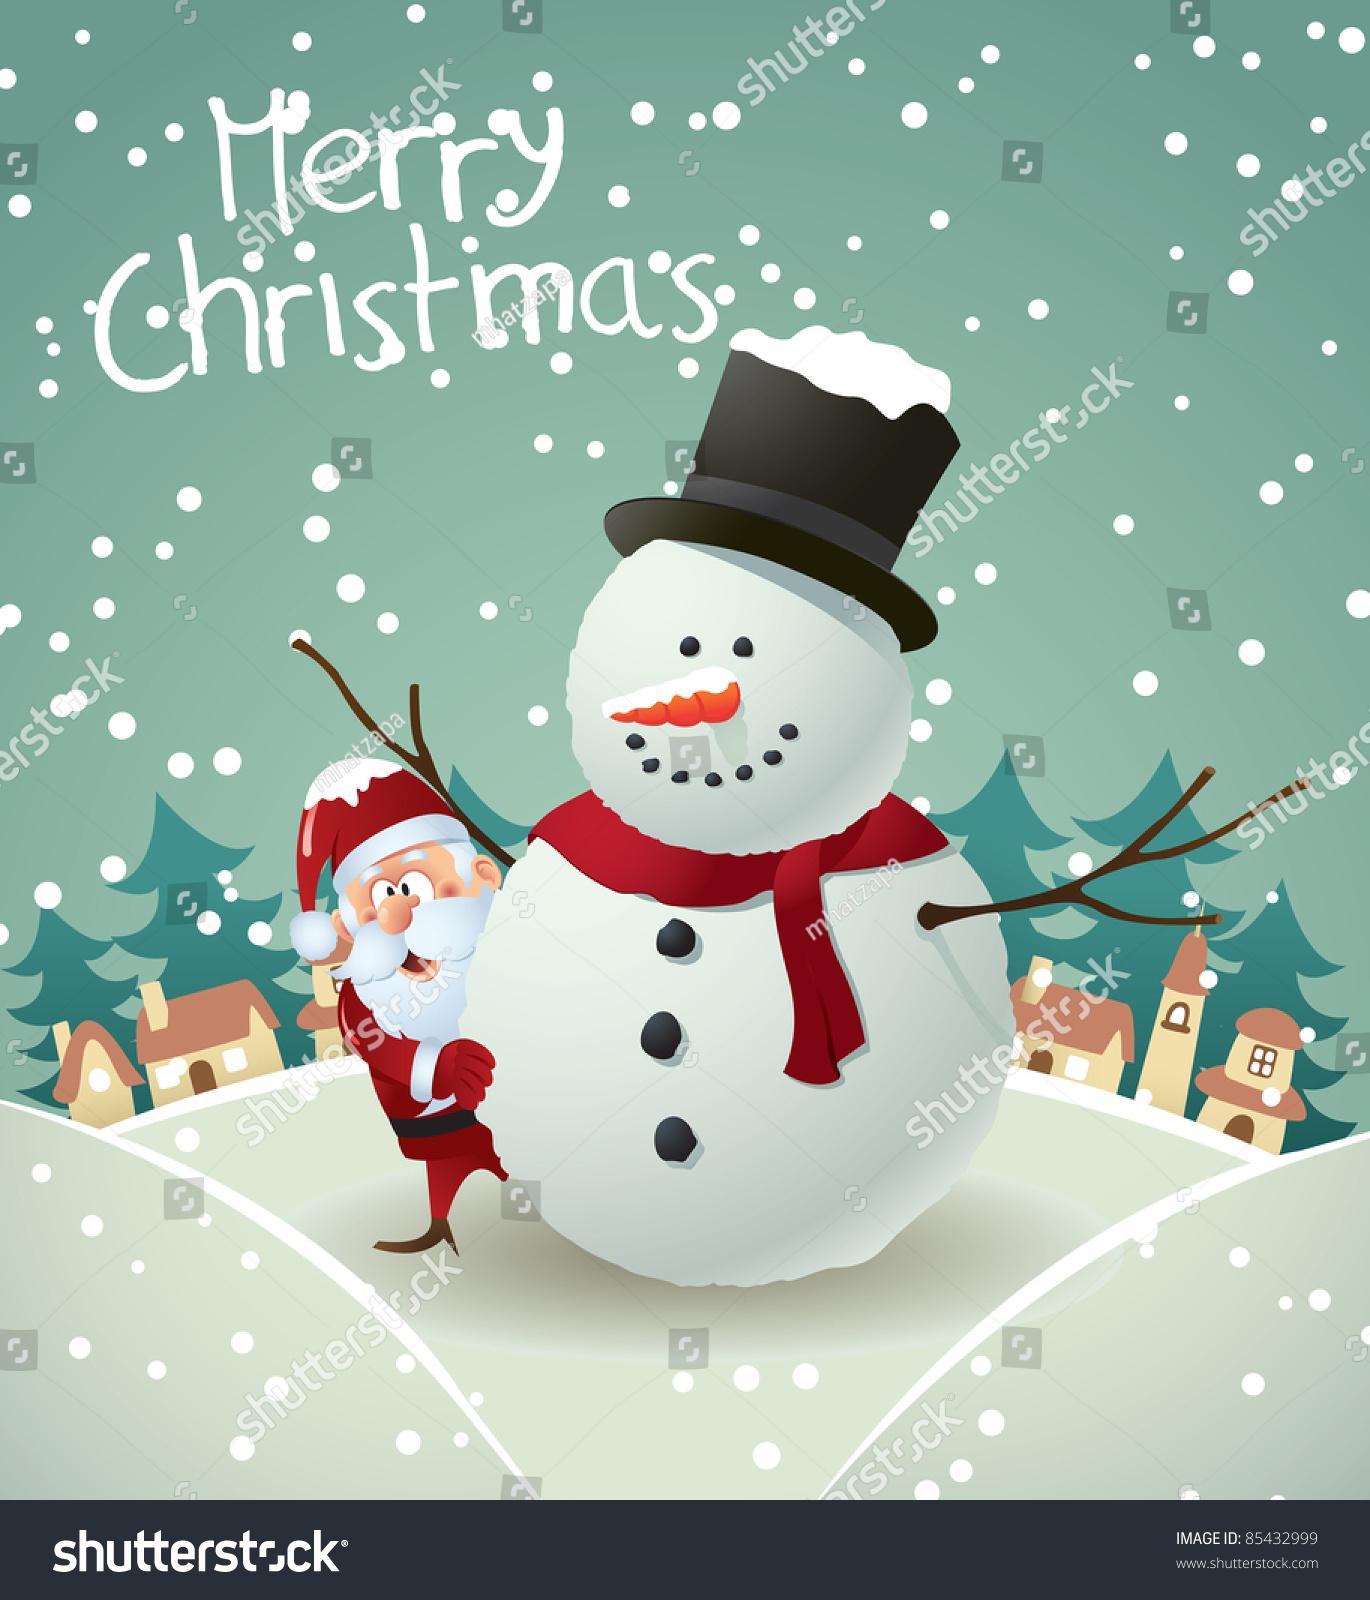 Cute Pink Snowman Wallpaper Santa Snowman Christmas Card Stock Vector 85432999